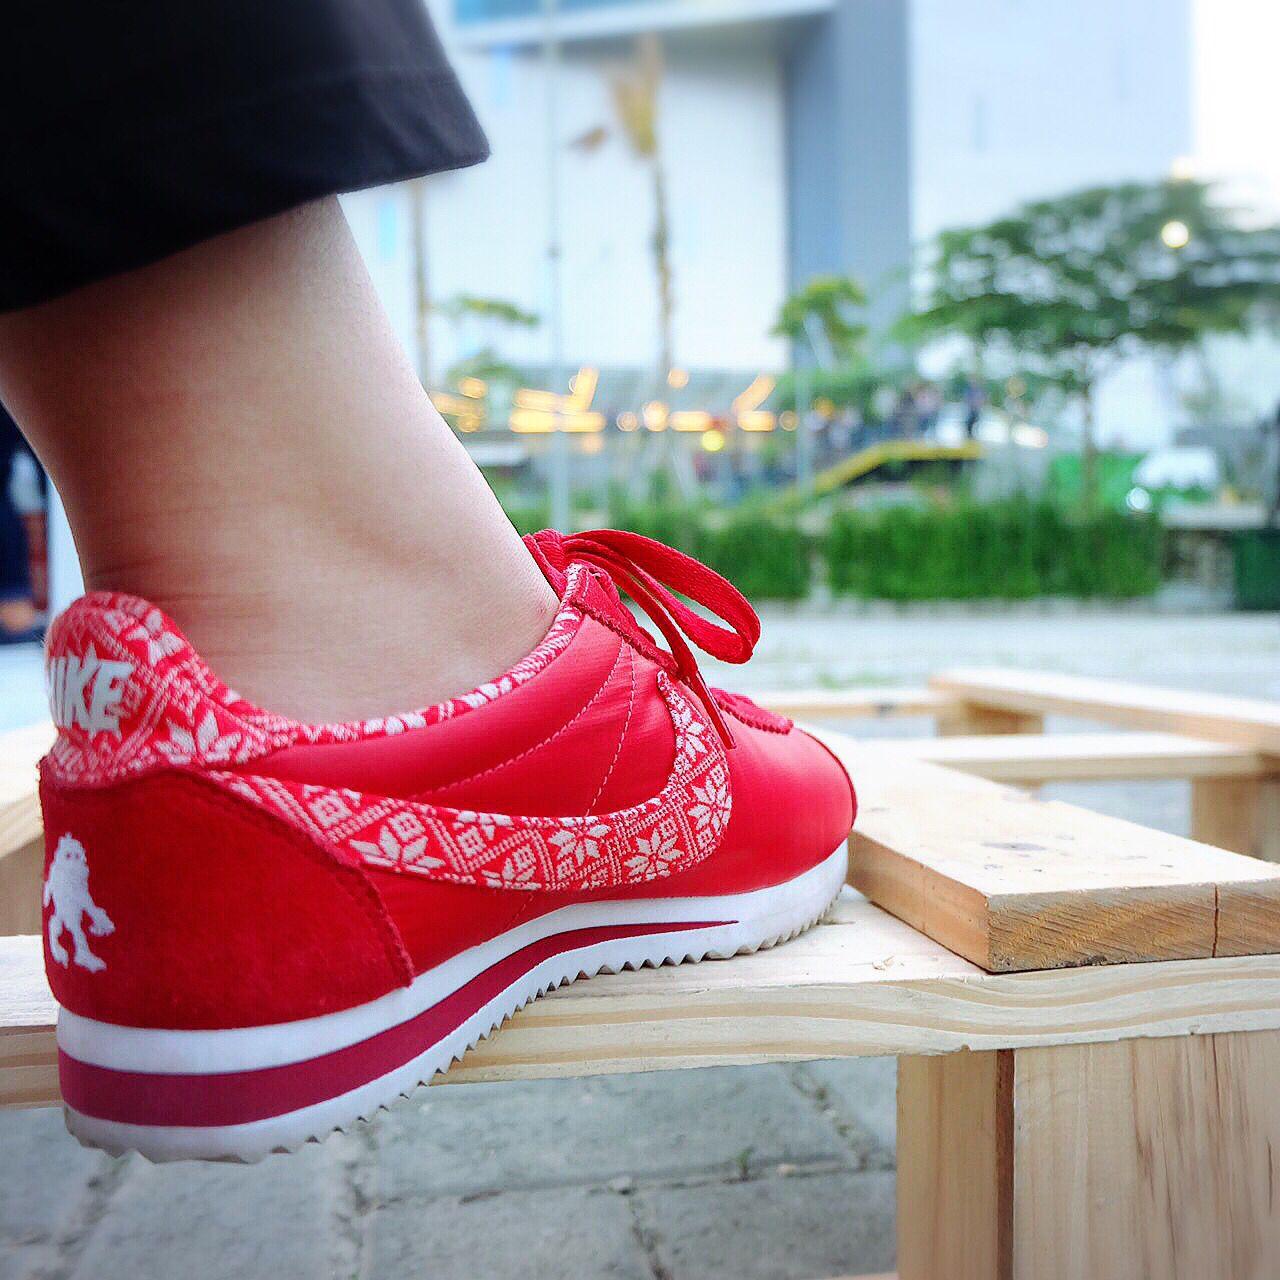 sports shoes dcedd 3c340 Nike cortez japan winter edition nike sneakers cortez nikecortez  redsneakers